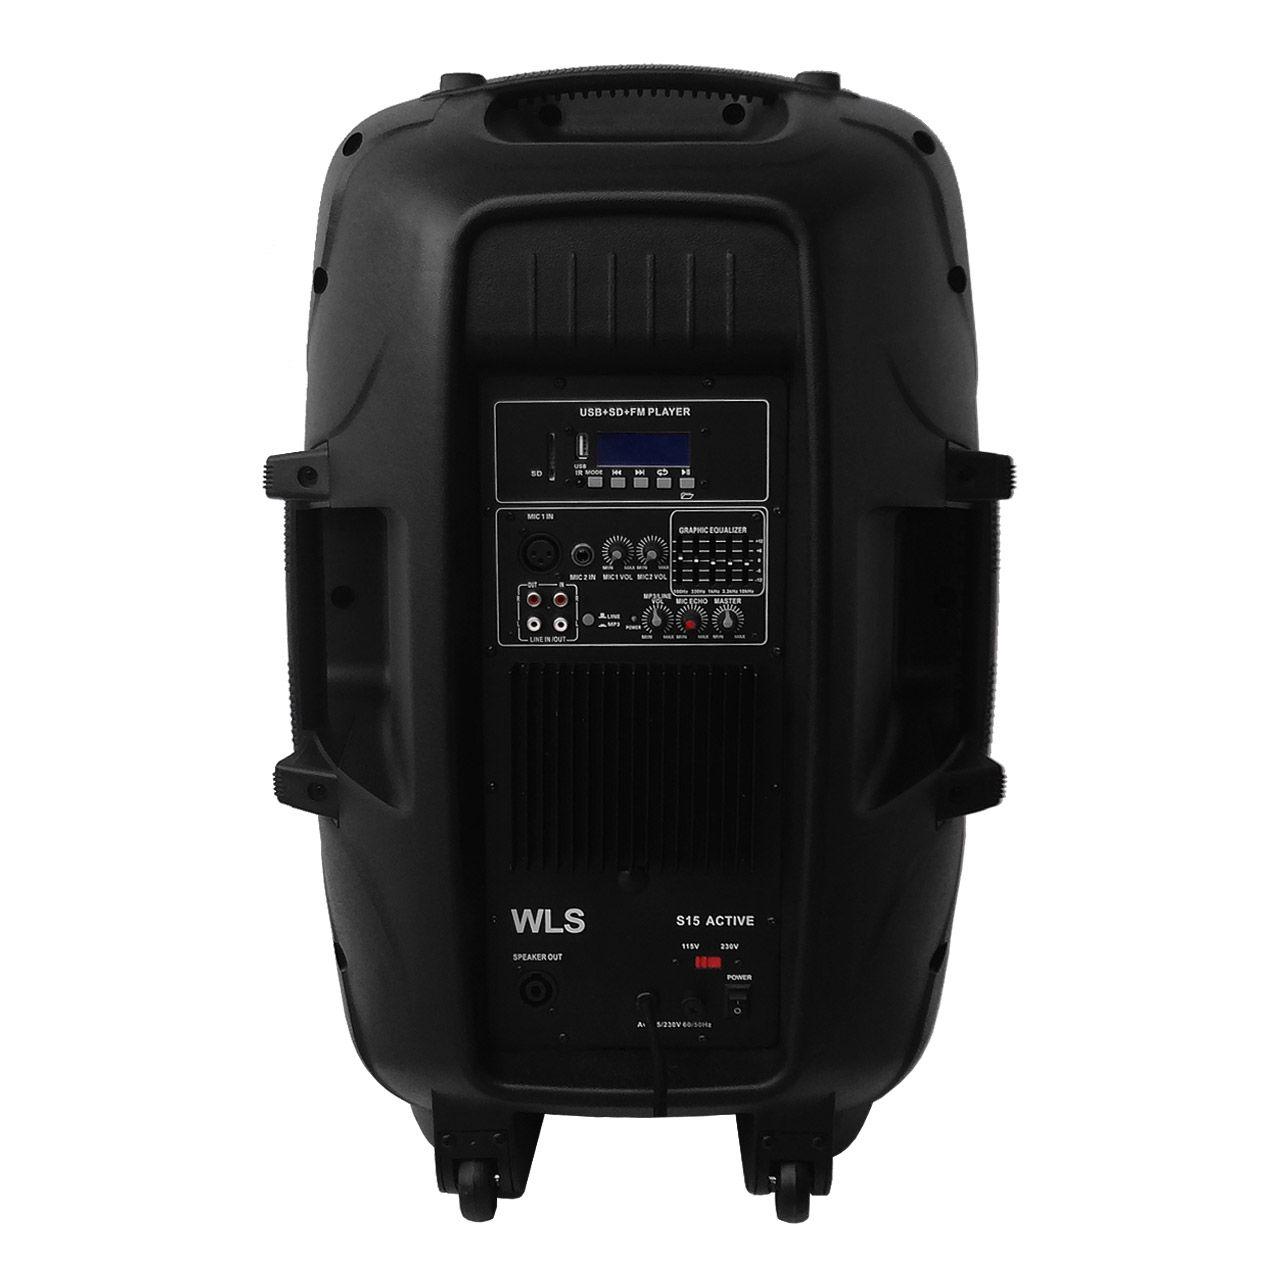 Kit Caixa De Som Ativa Passiva Wls S15 Bluetooth 430w Rms + Cabo